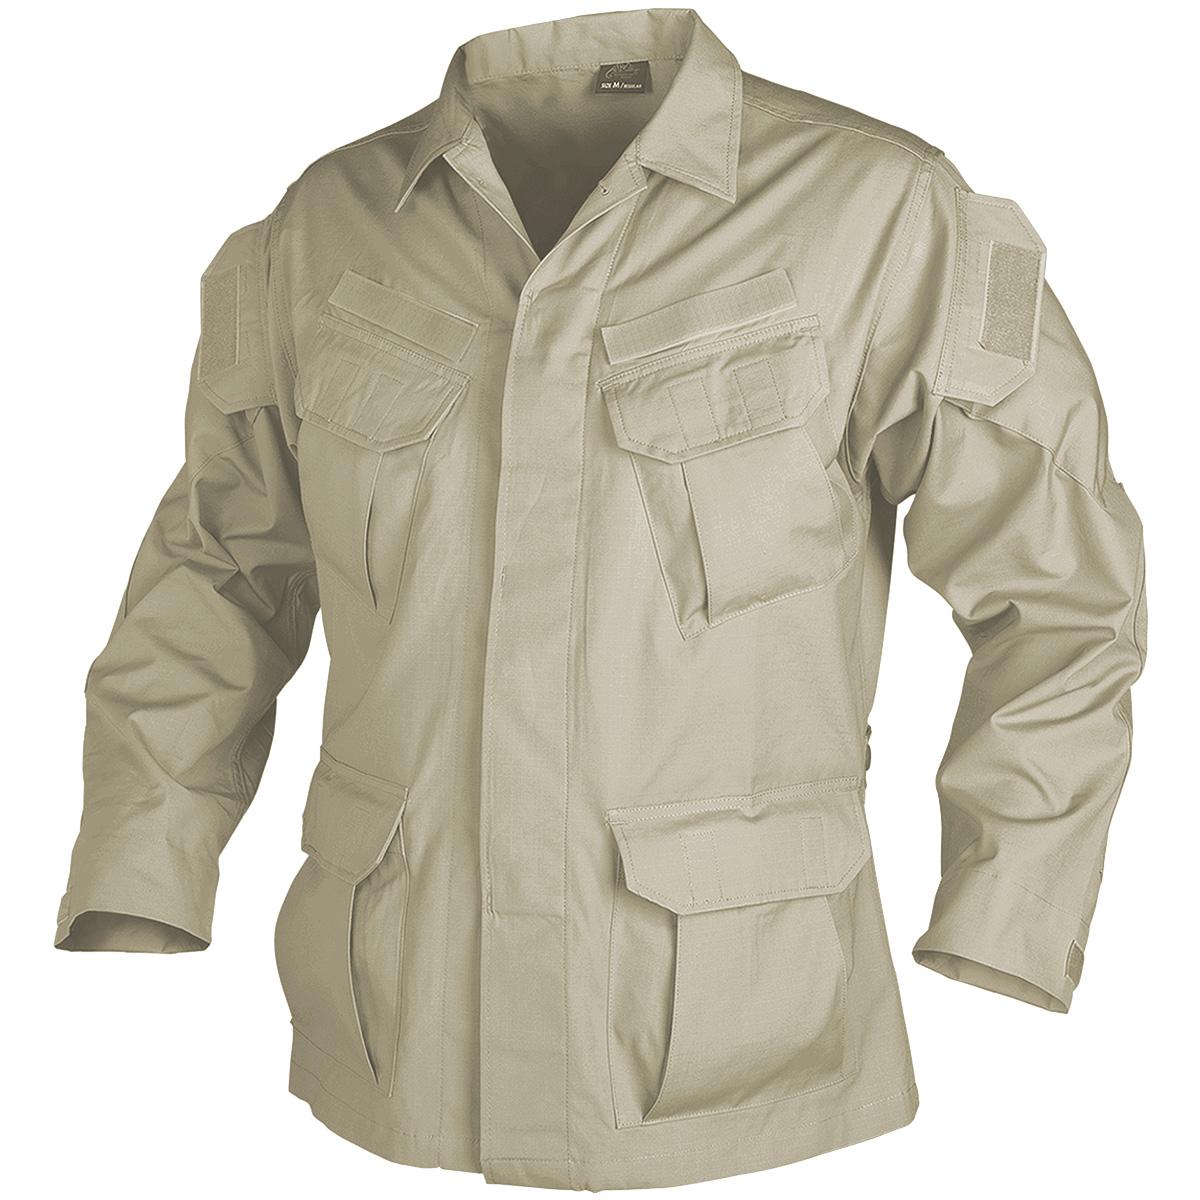 Helikon sfu shirt cotton ripstop khaki helikon sfu for 6 dollar shirts coupon code free shipping